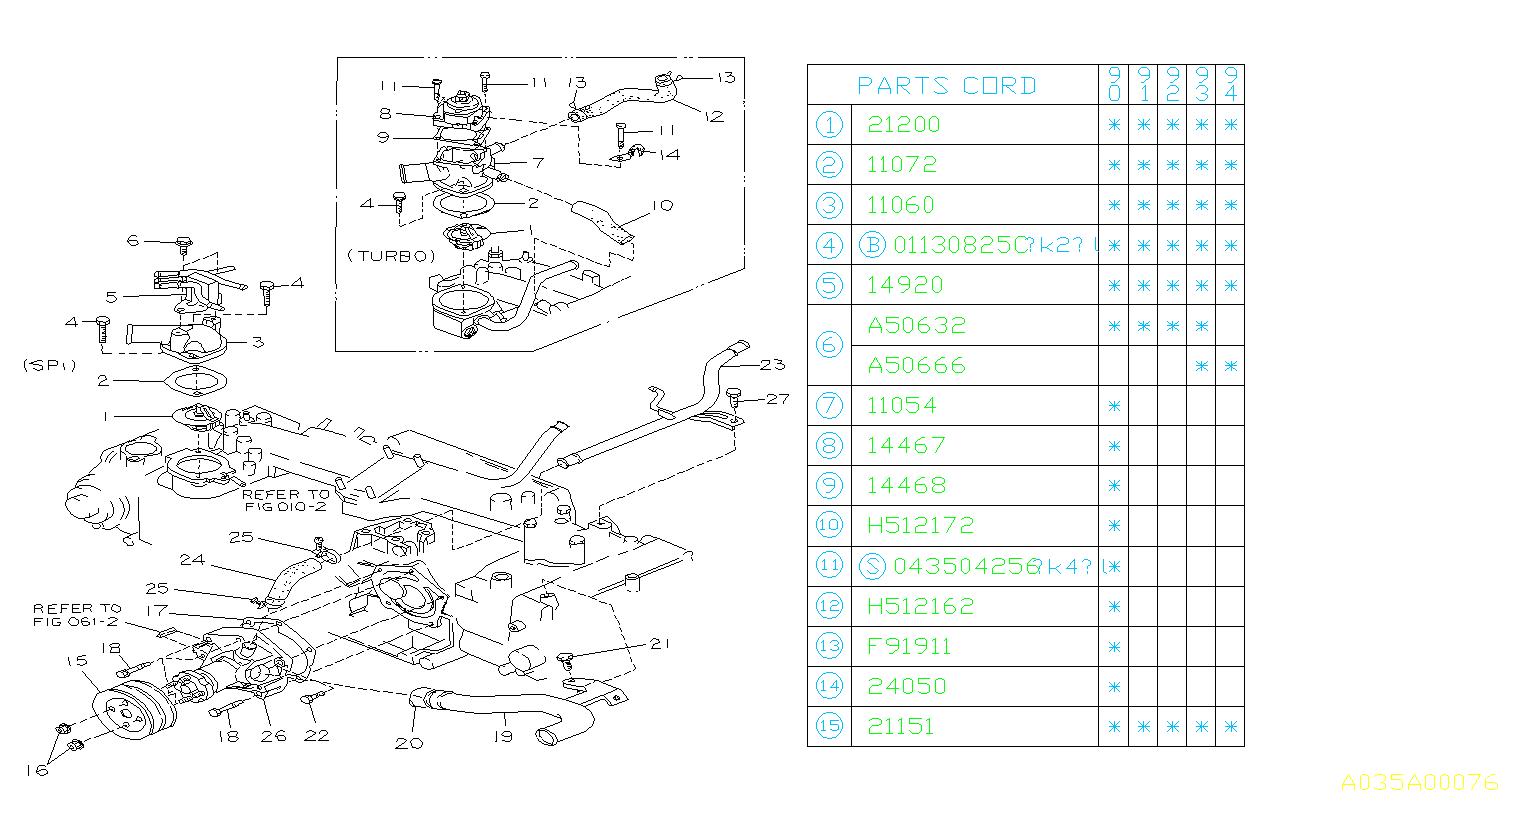 807512172 - Hose. Mpi & b. Pump, water, cooling - Genuine ...